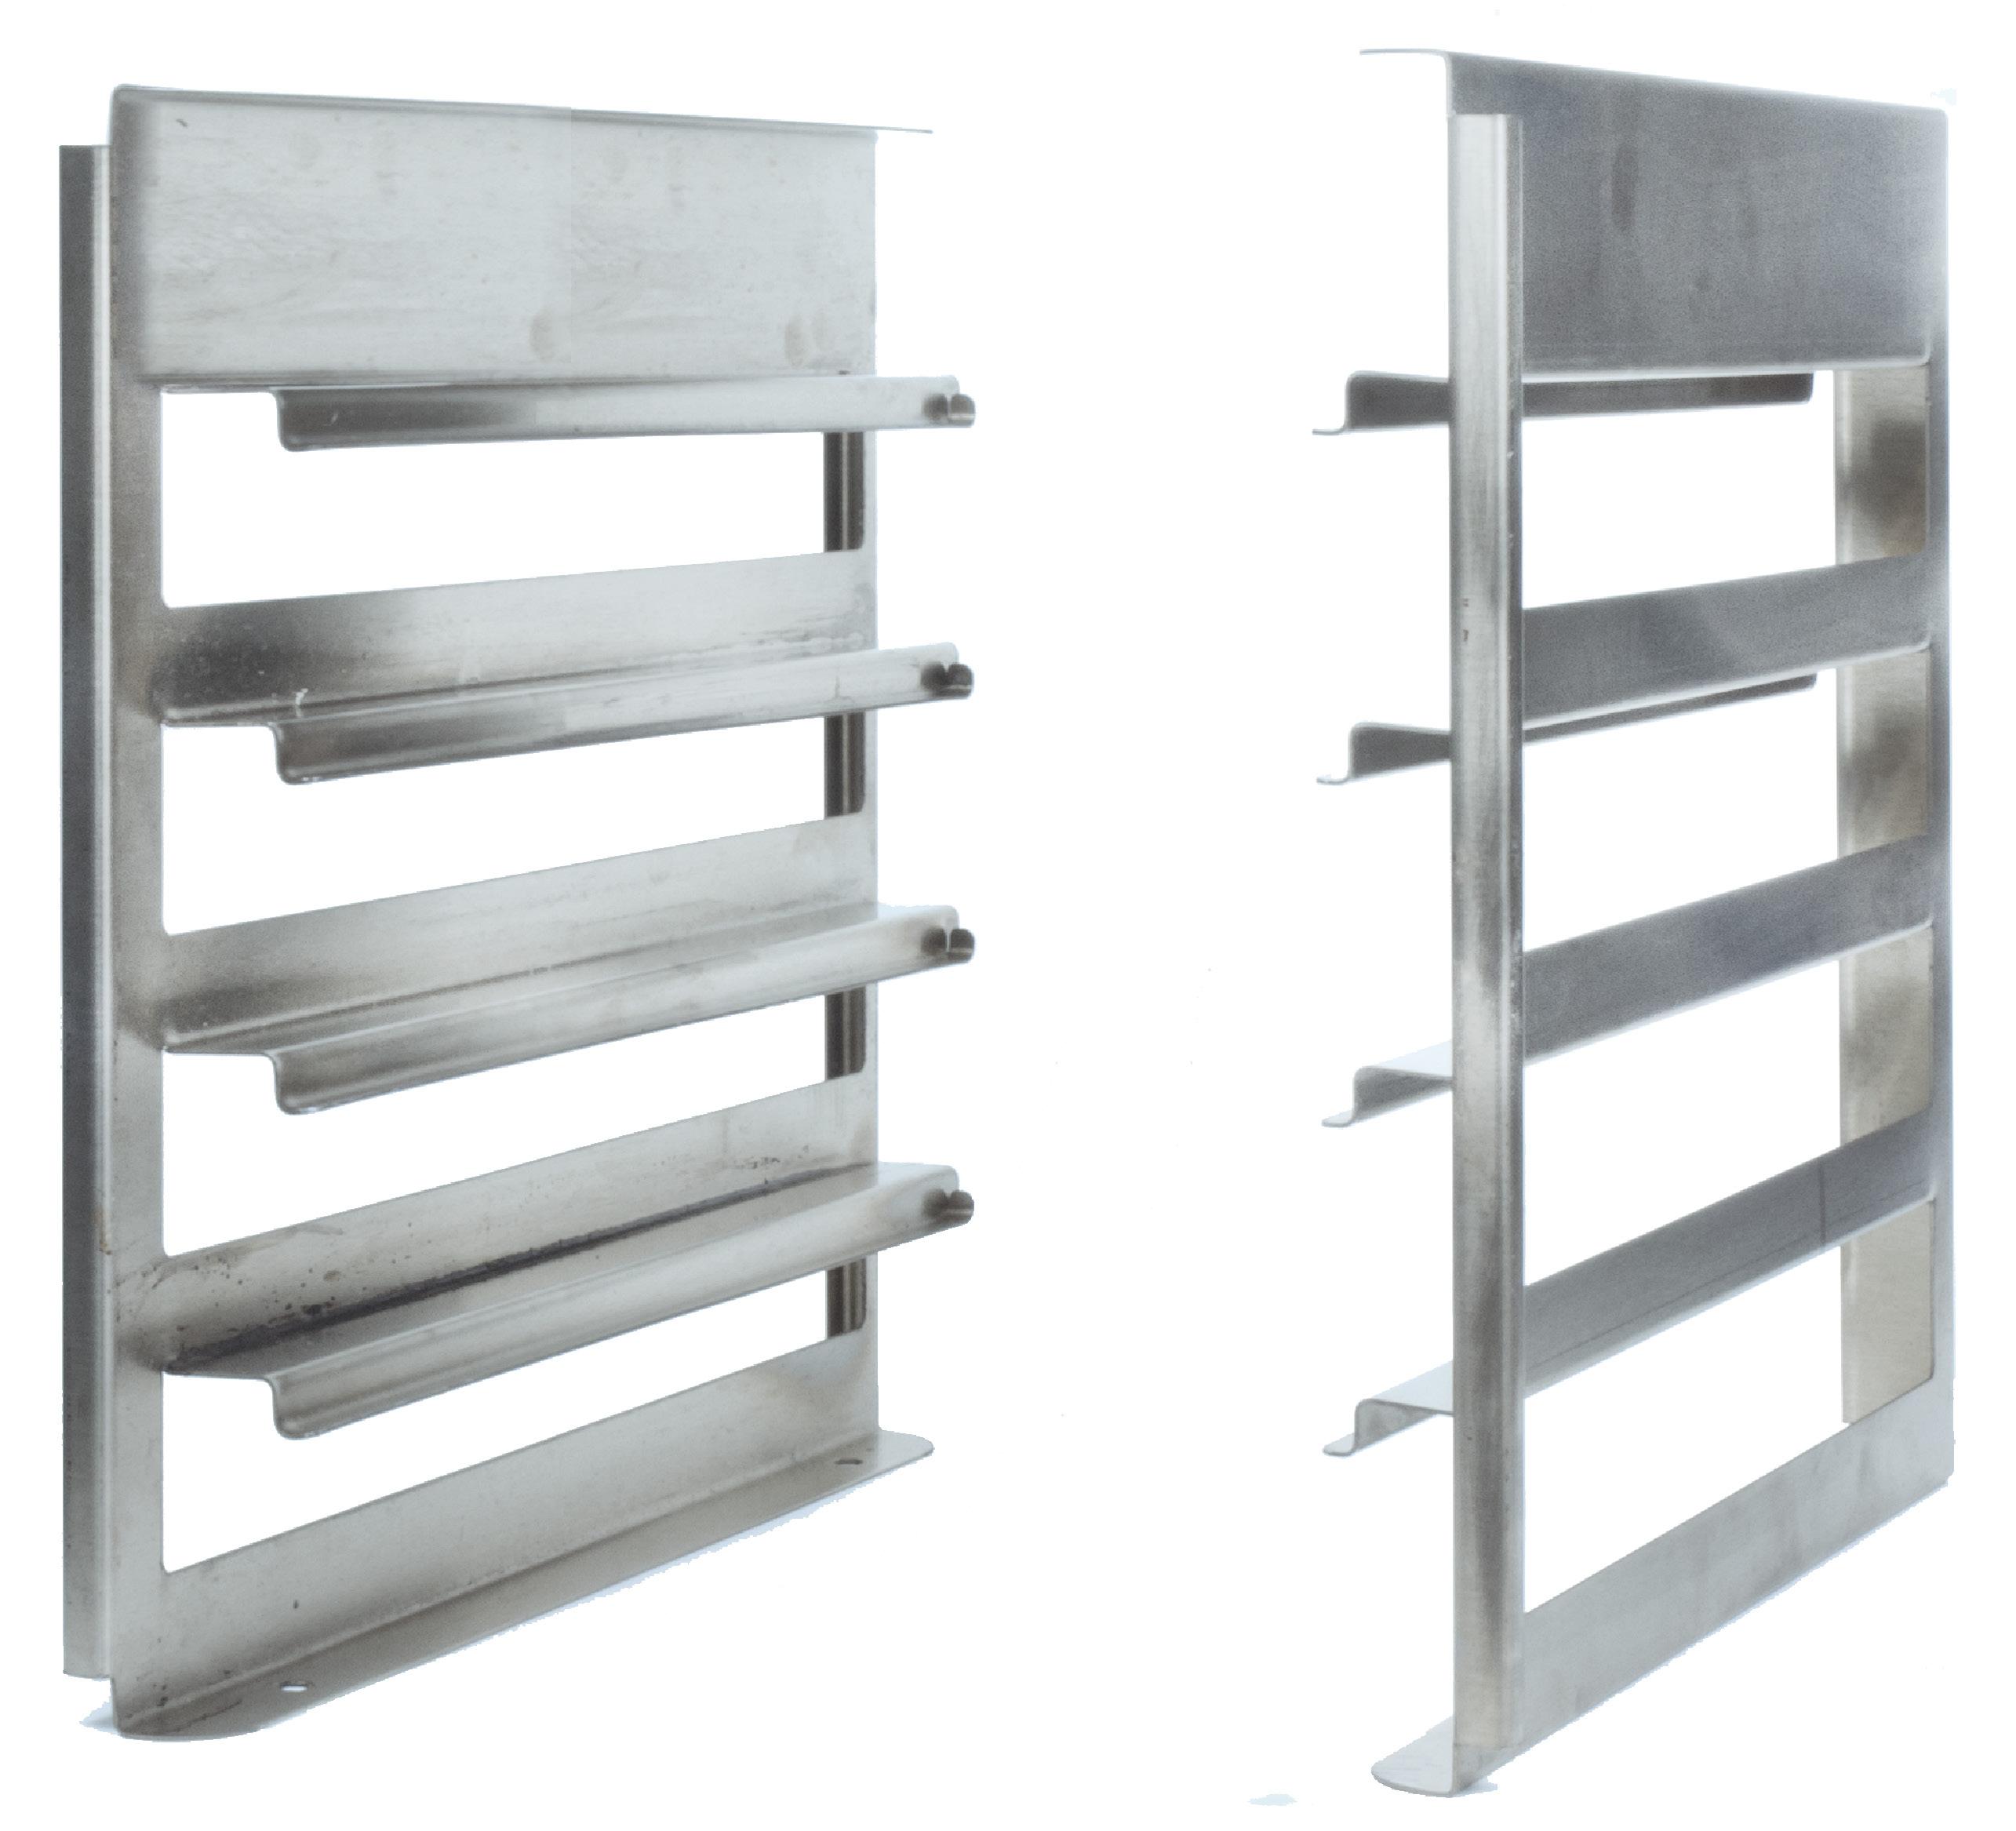 Eurast 42215202 Pastry rack (pair) 8 levels for 8 series ovens